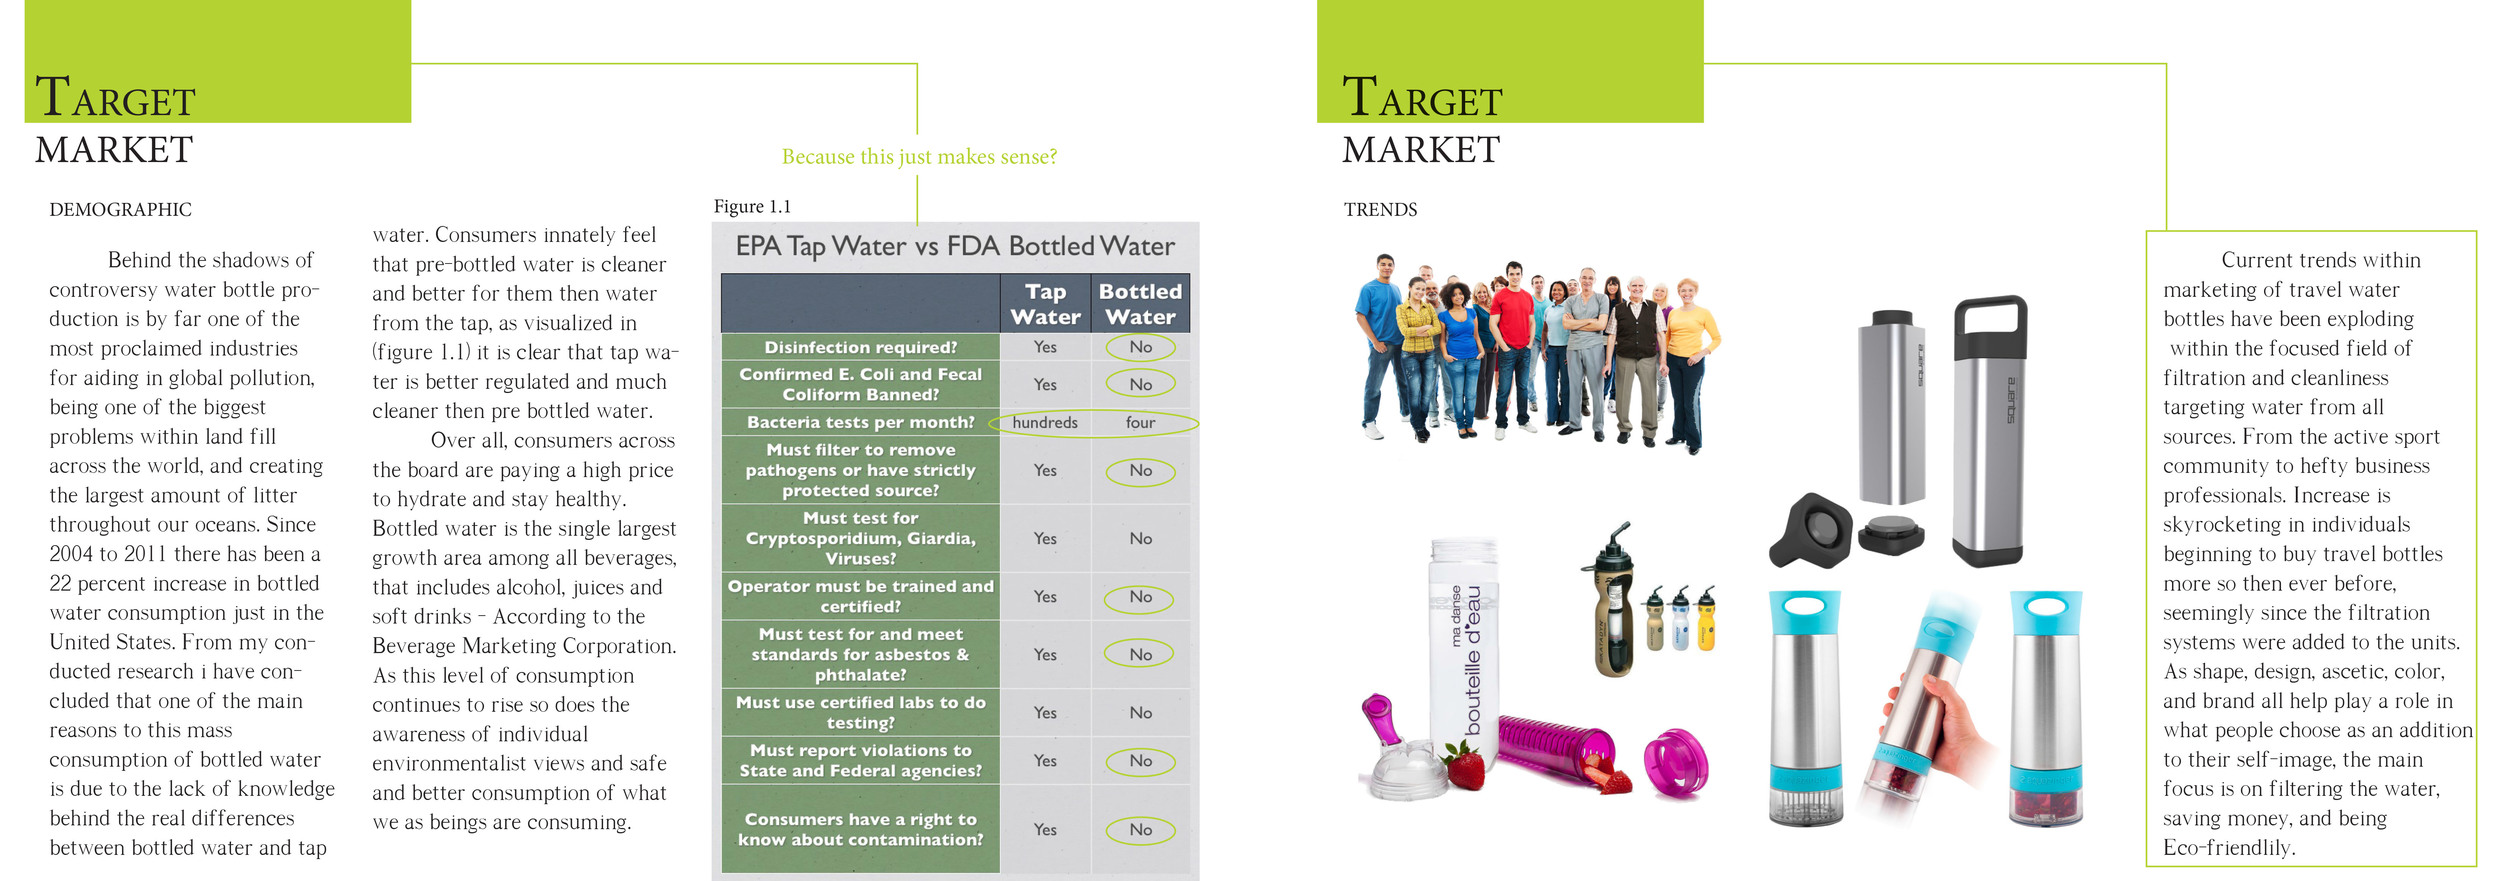 water bottle fesibility Alex M Speer-5.jpg